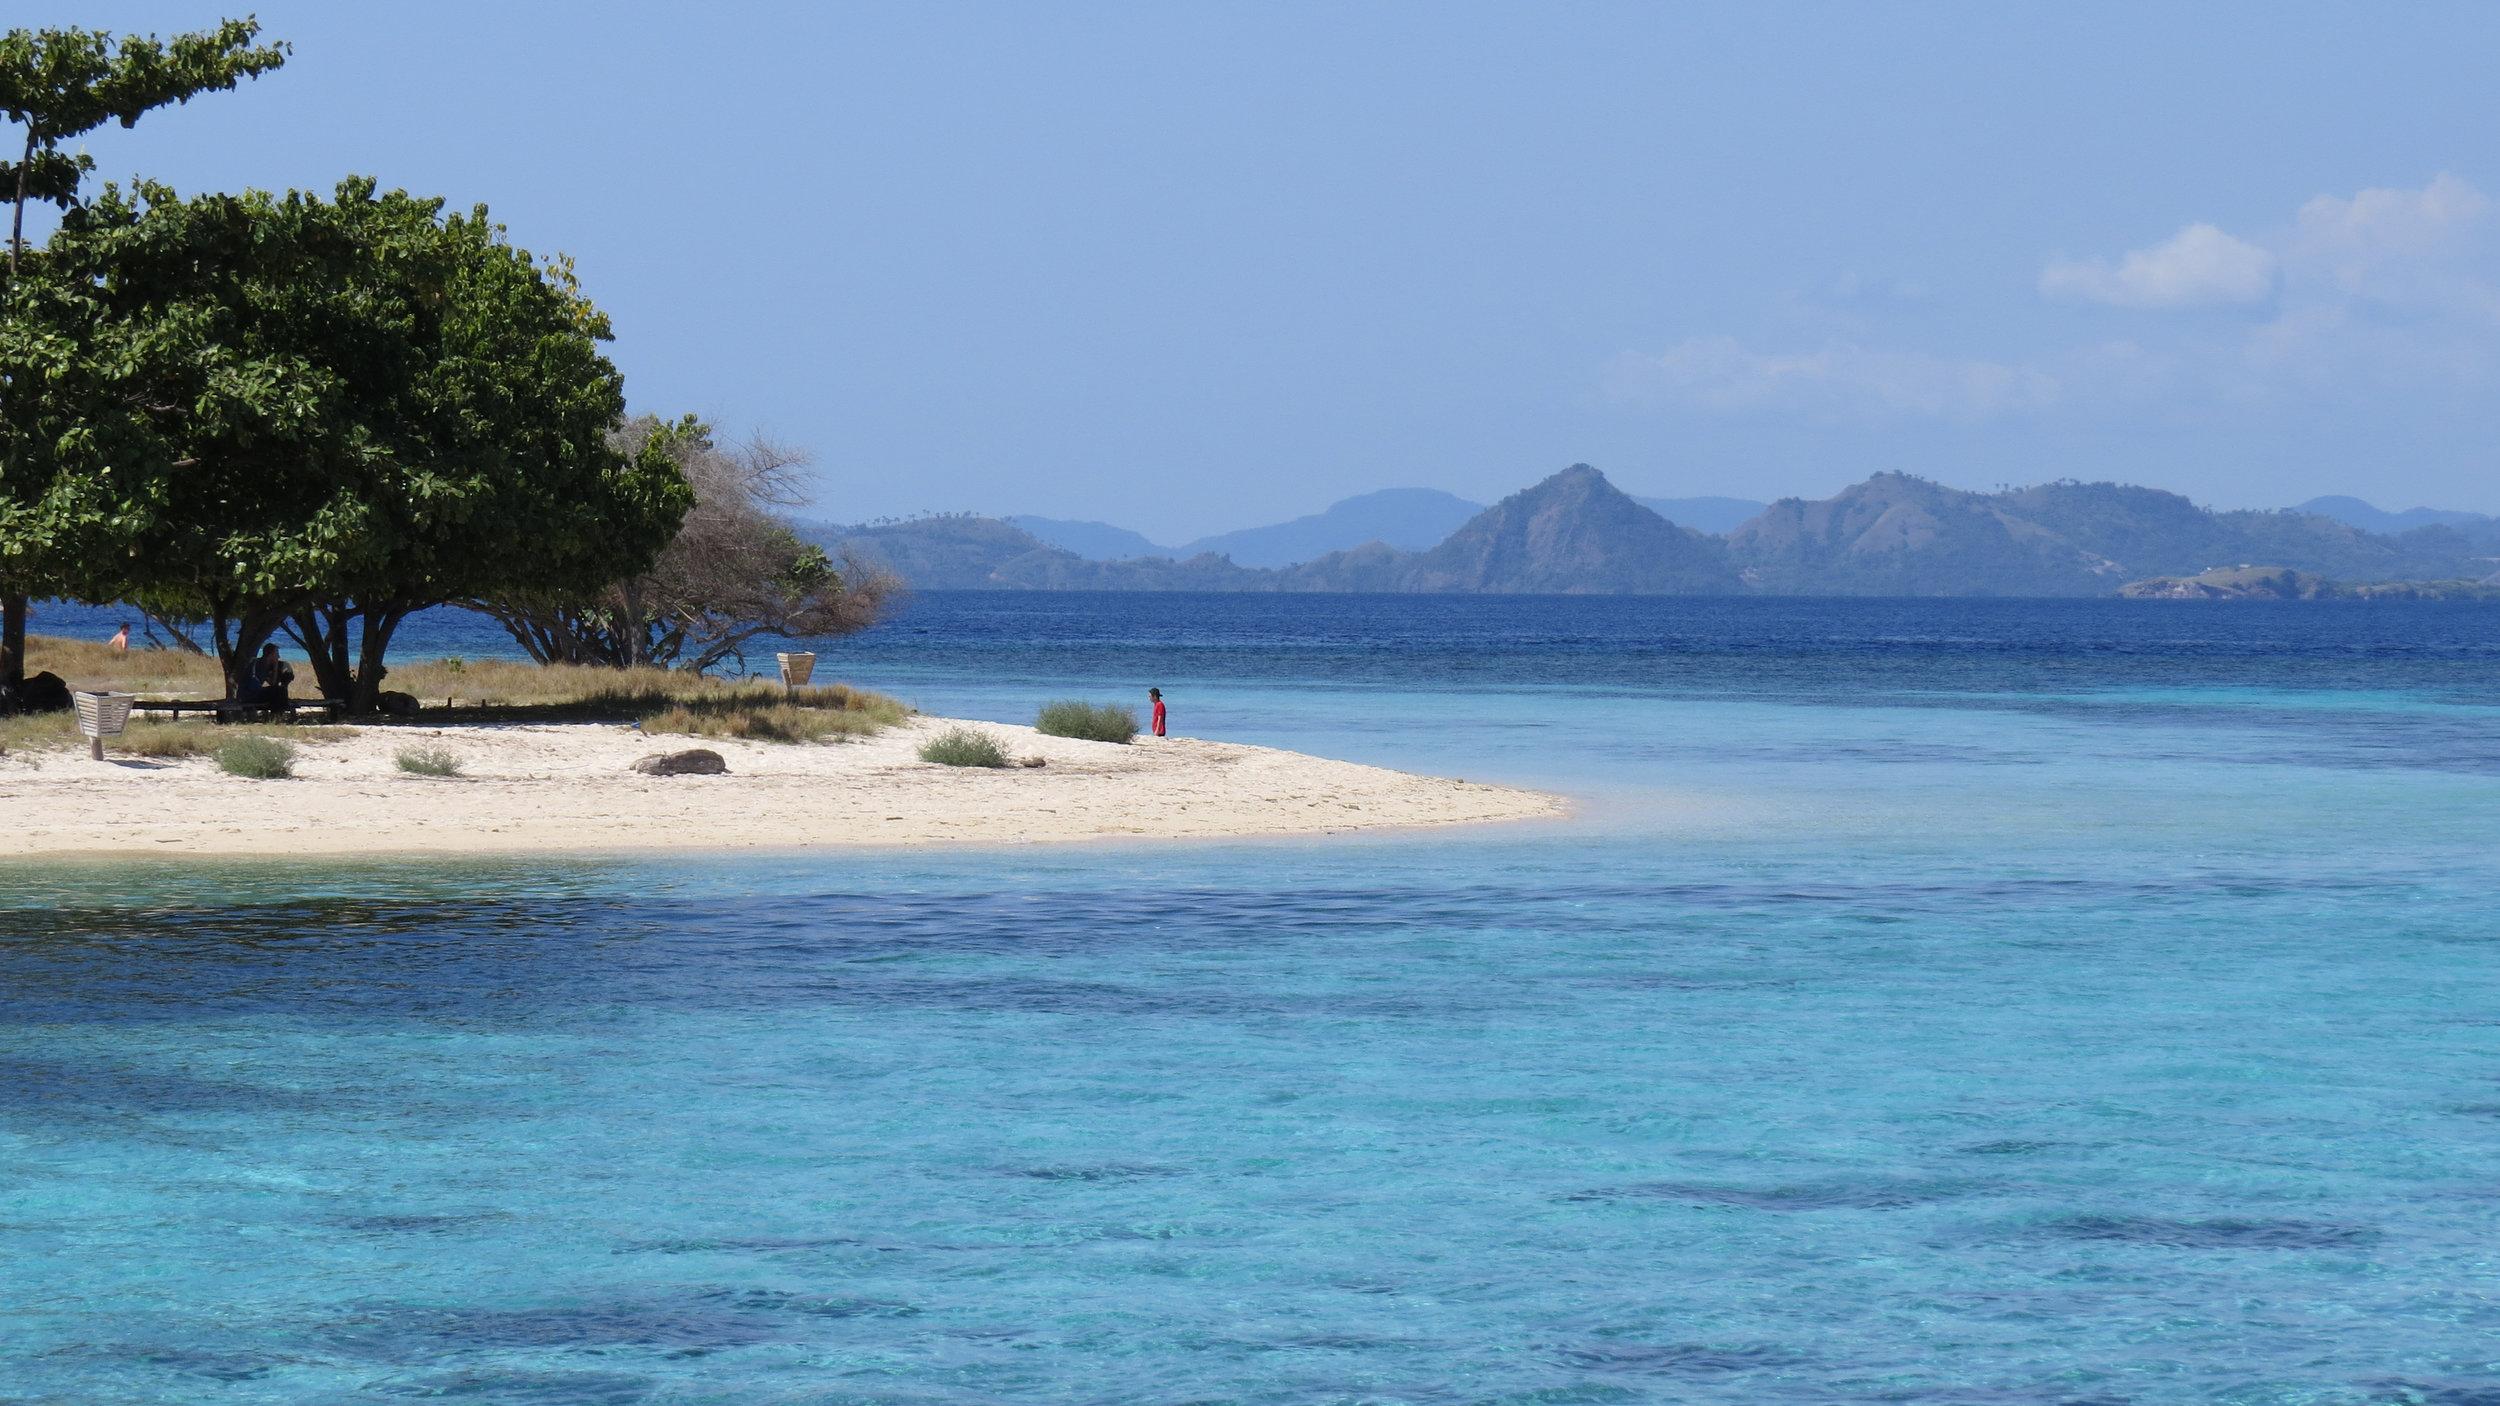 kanawa island komodo national park.jpg